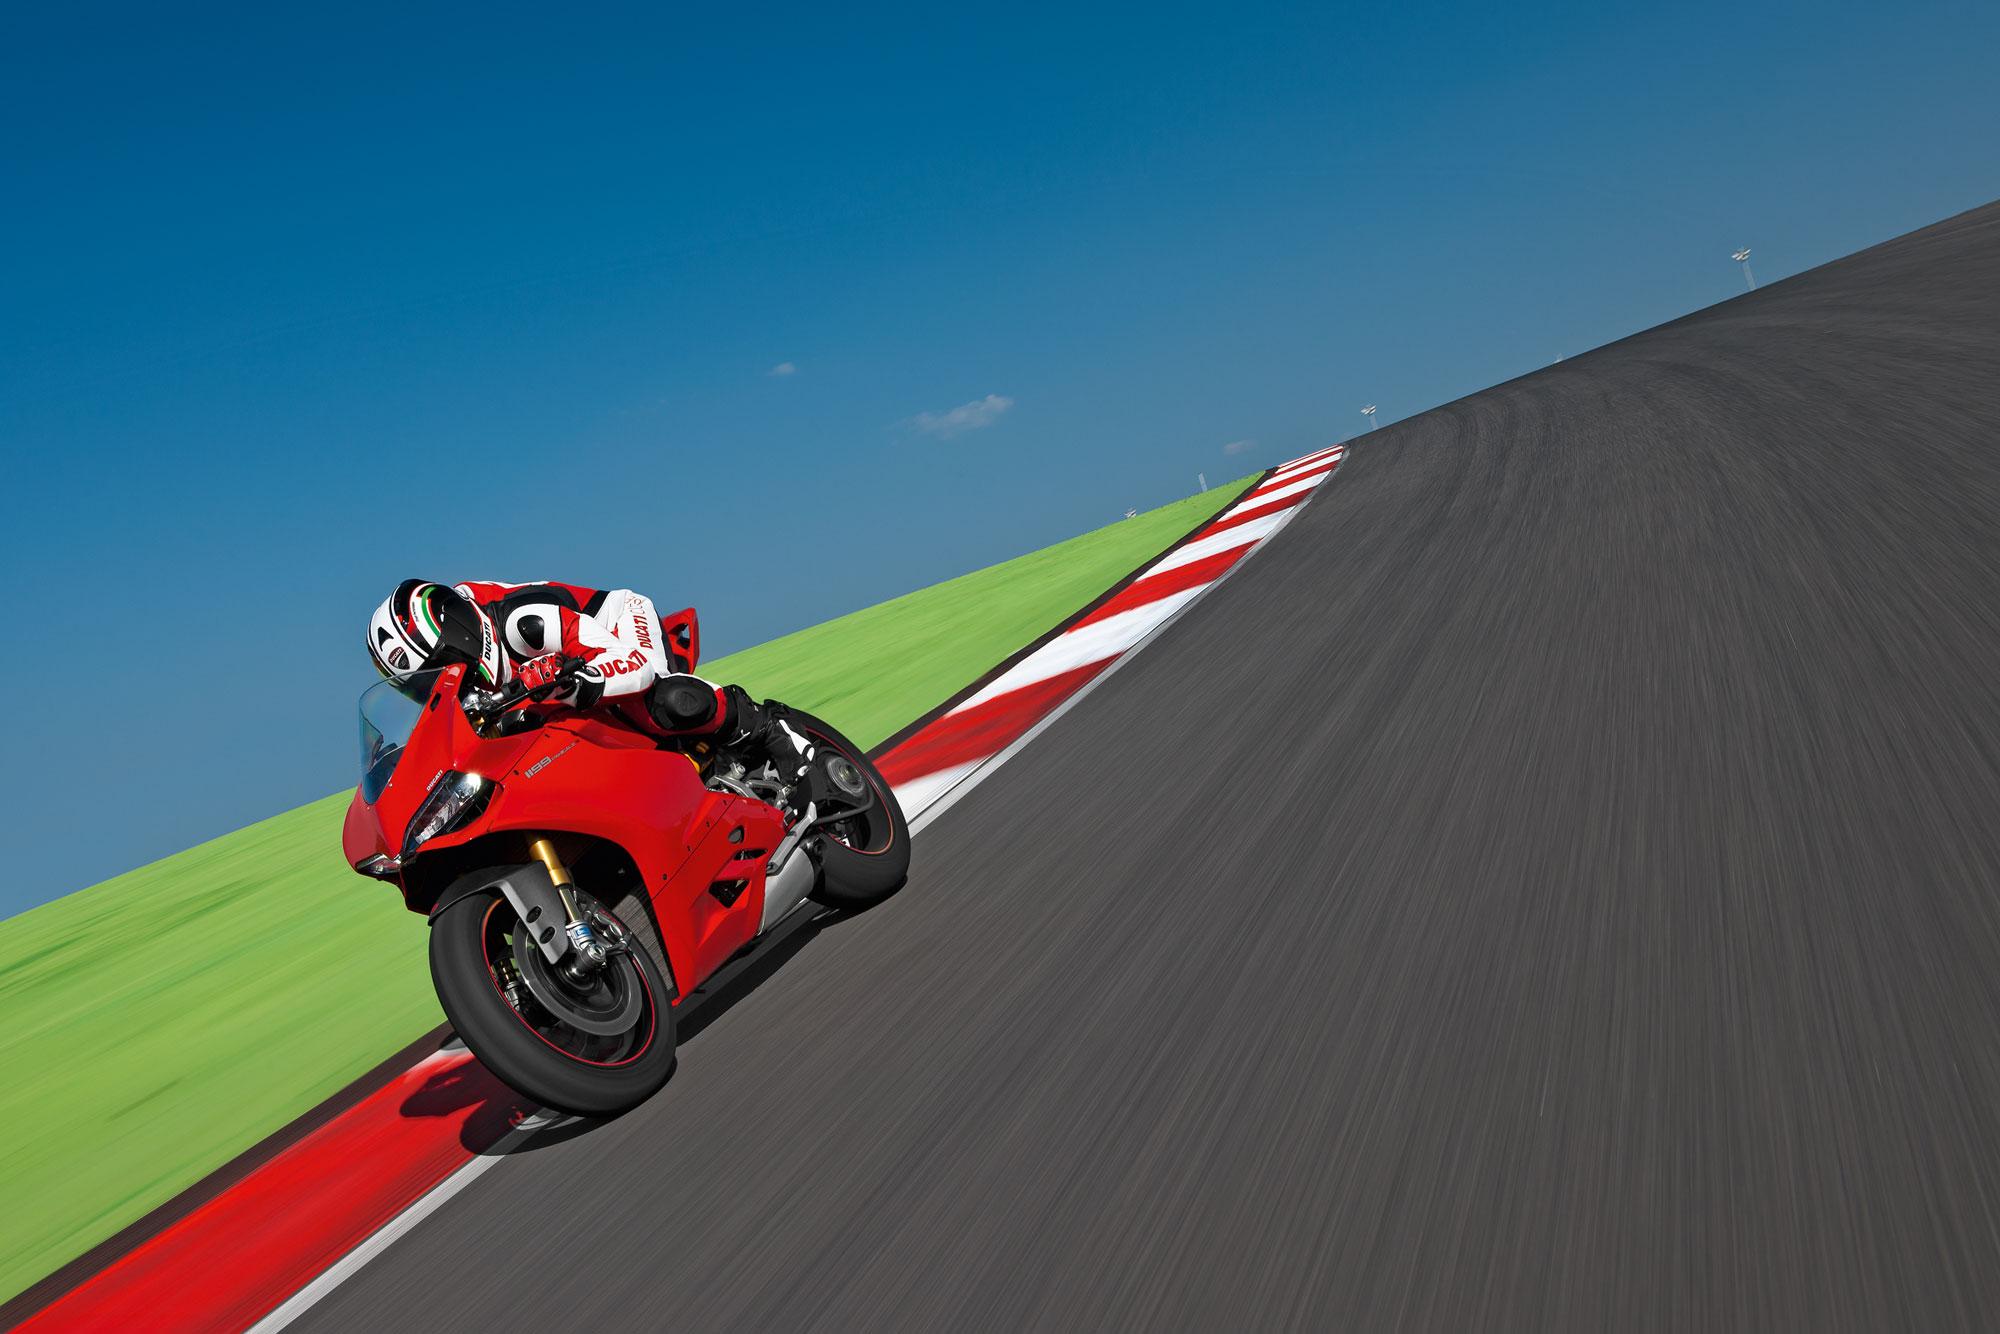 Ducati 1199 Panigale - 2000x1334